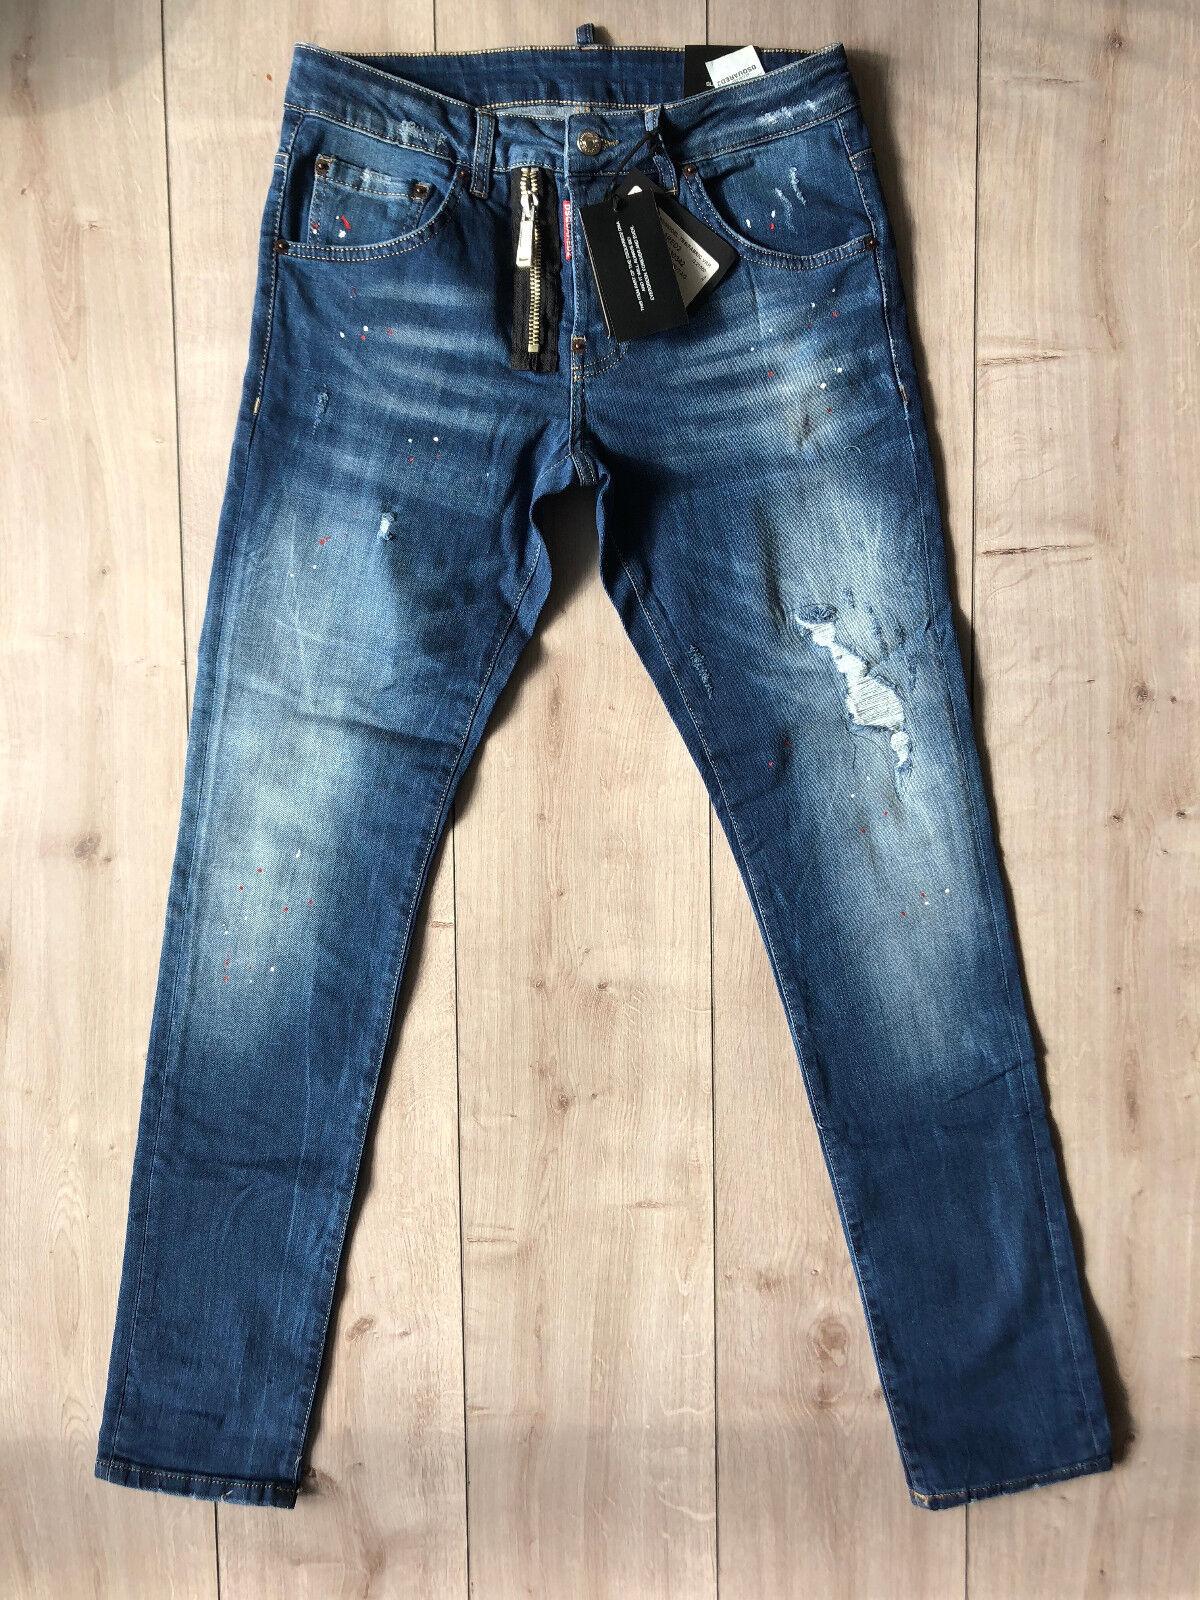 NWTDsquared Slim Jean Jeans W34 L34 (Waist 88 cm) Size 48